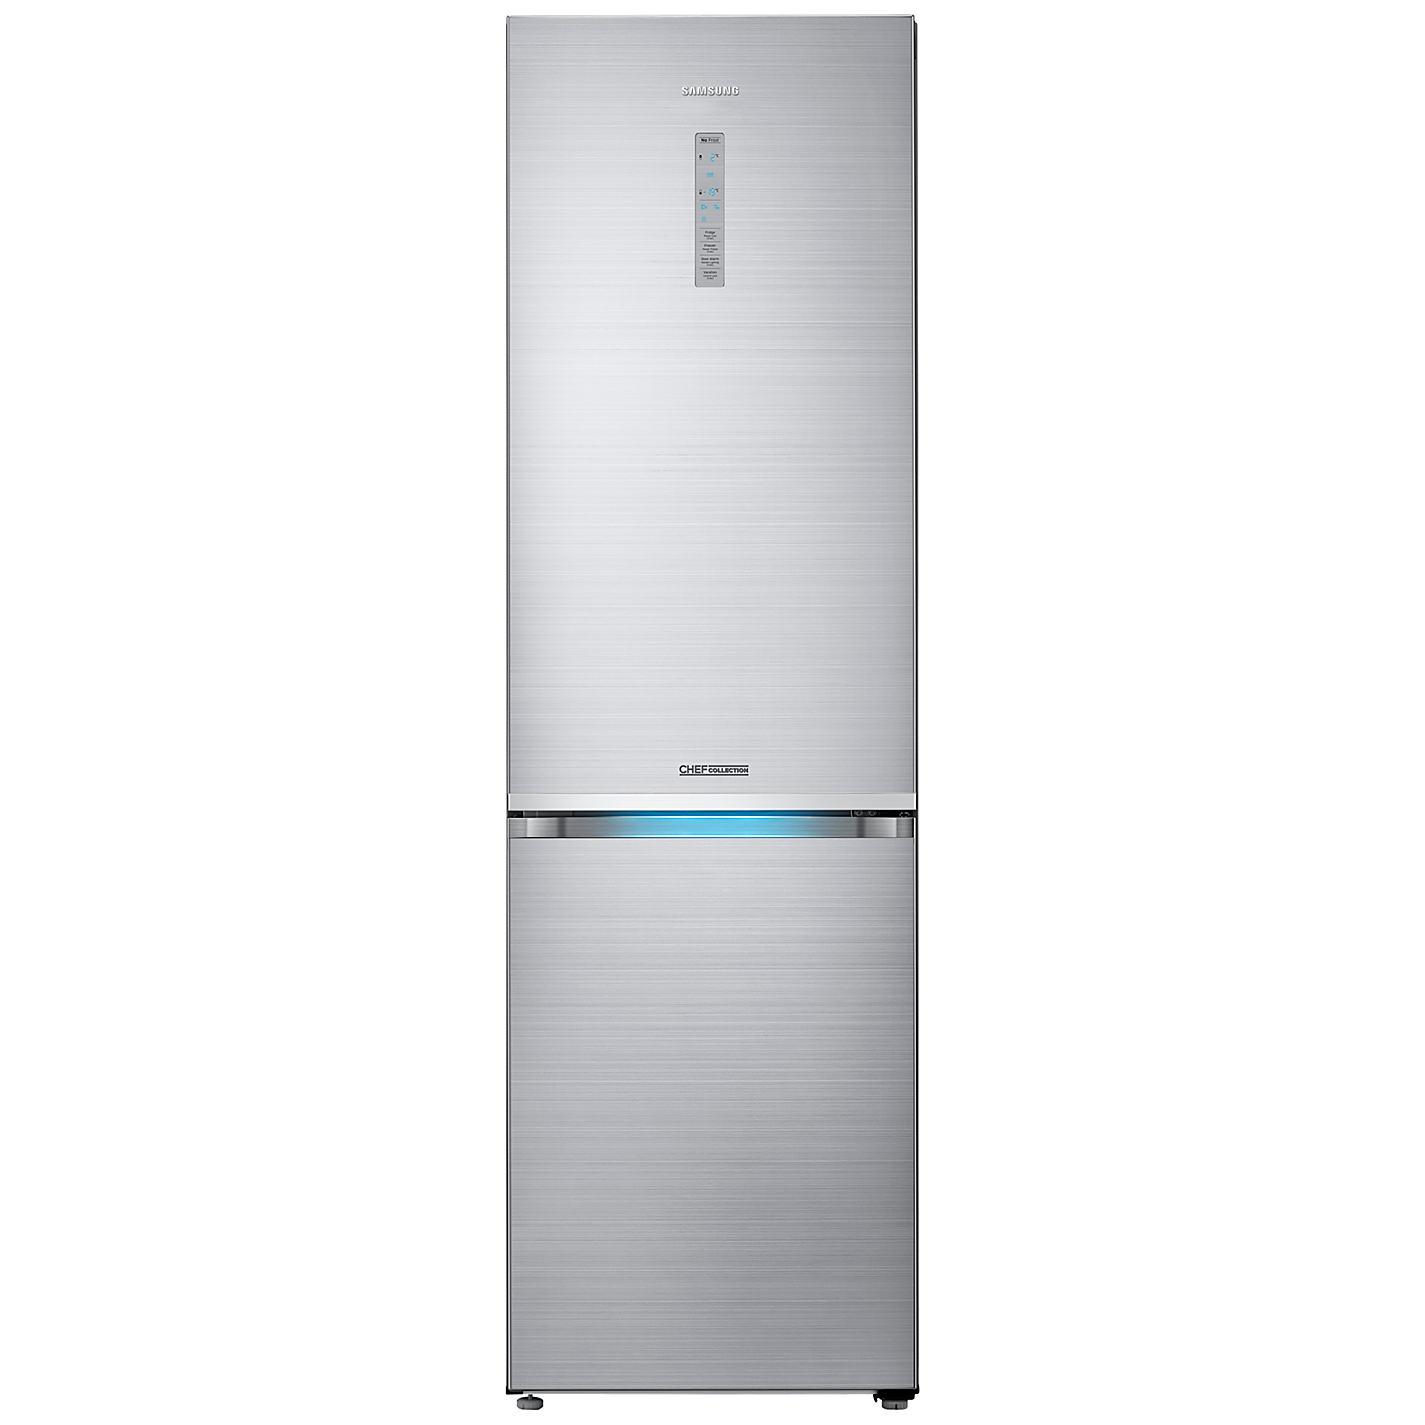 Samsung RB41J7859S4/EU Frost Free Fridge Freezer